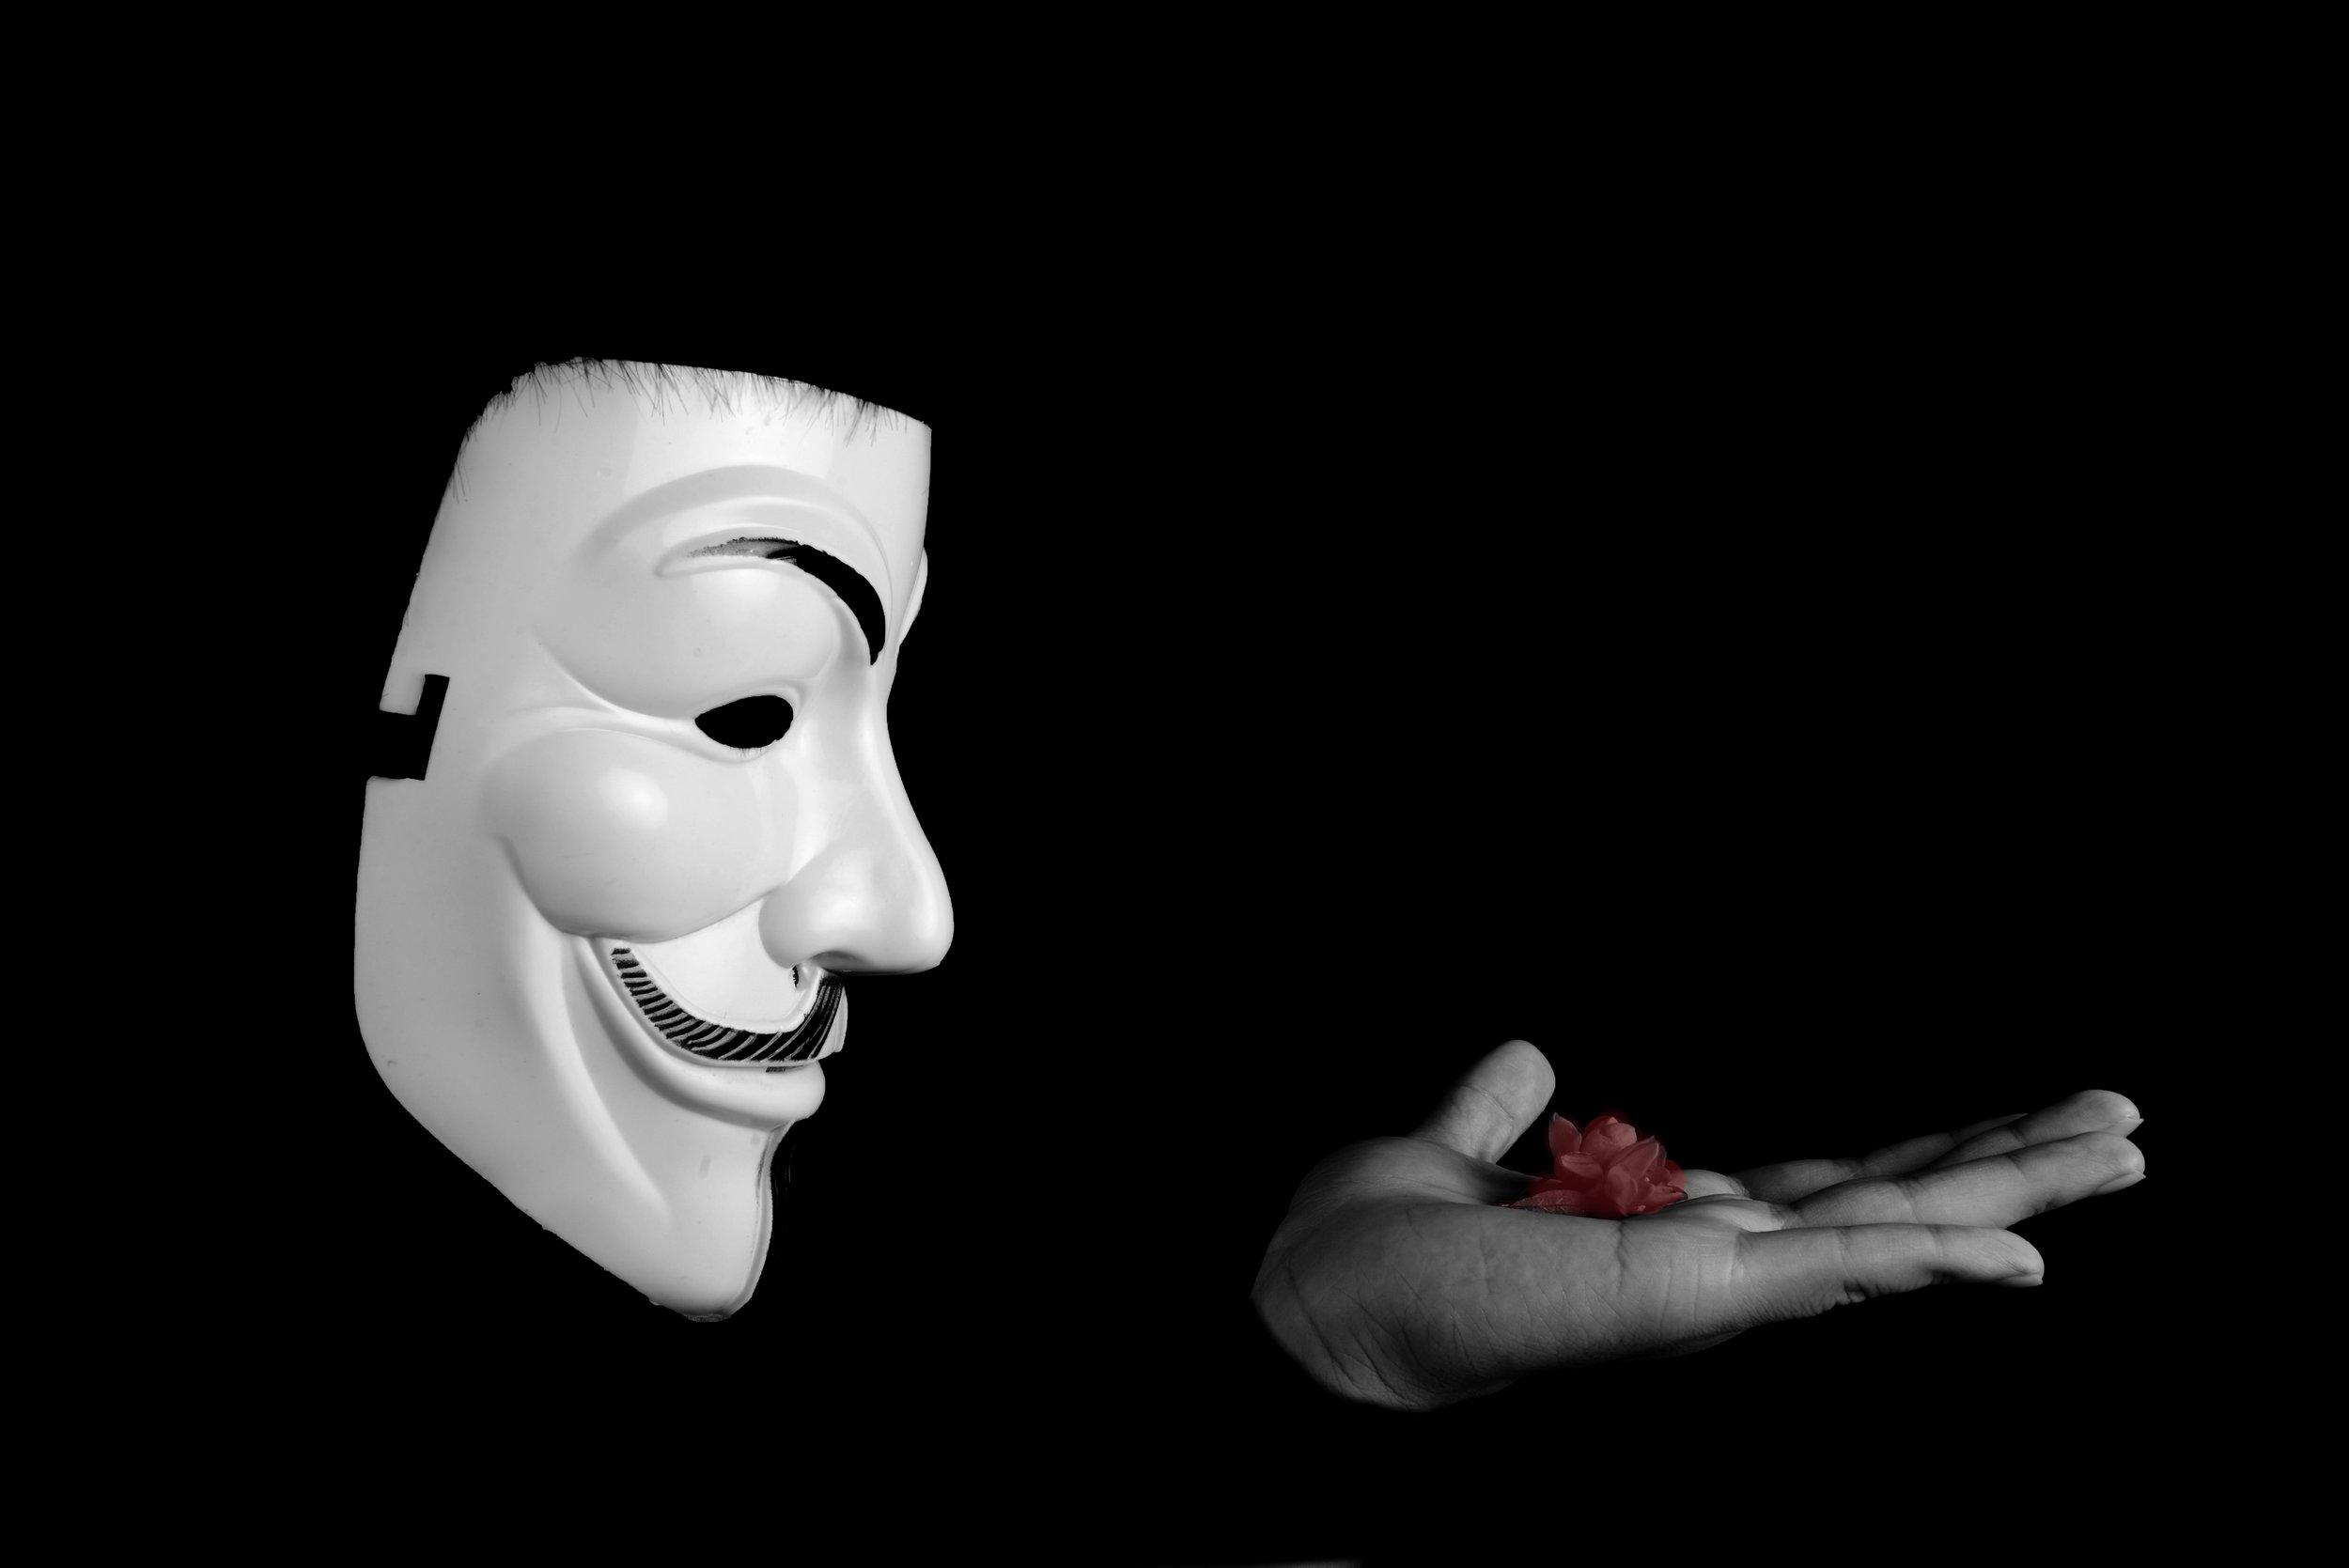 activist-anonymous-ddos-attack-38275.jpg